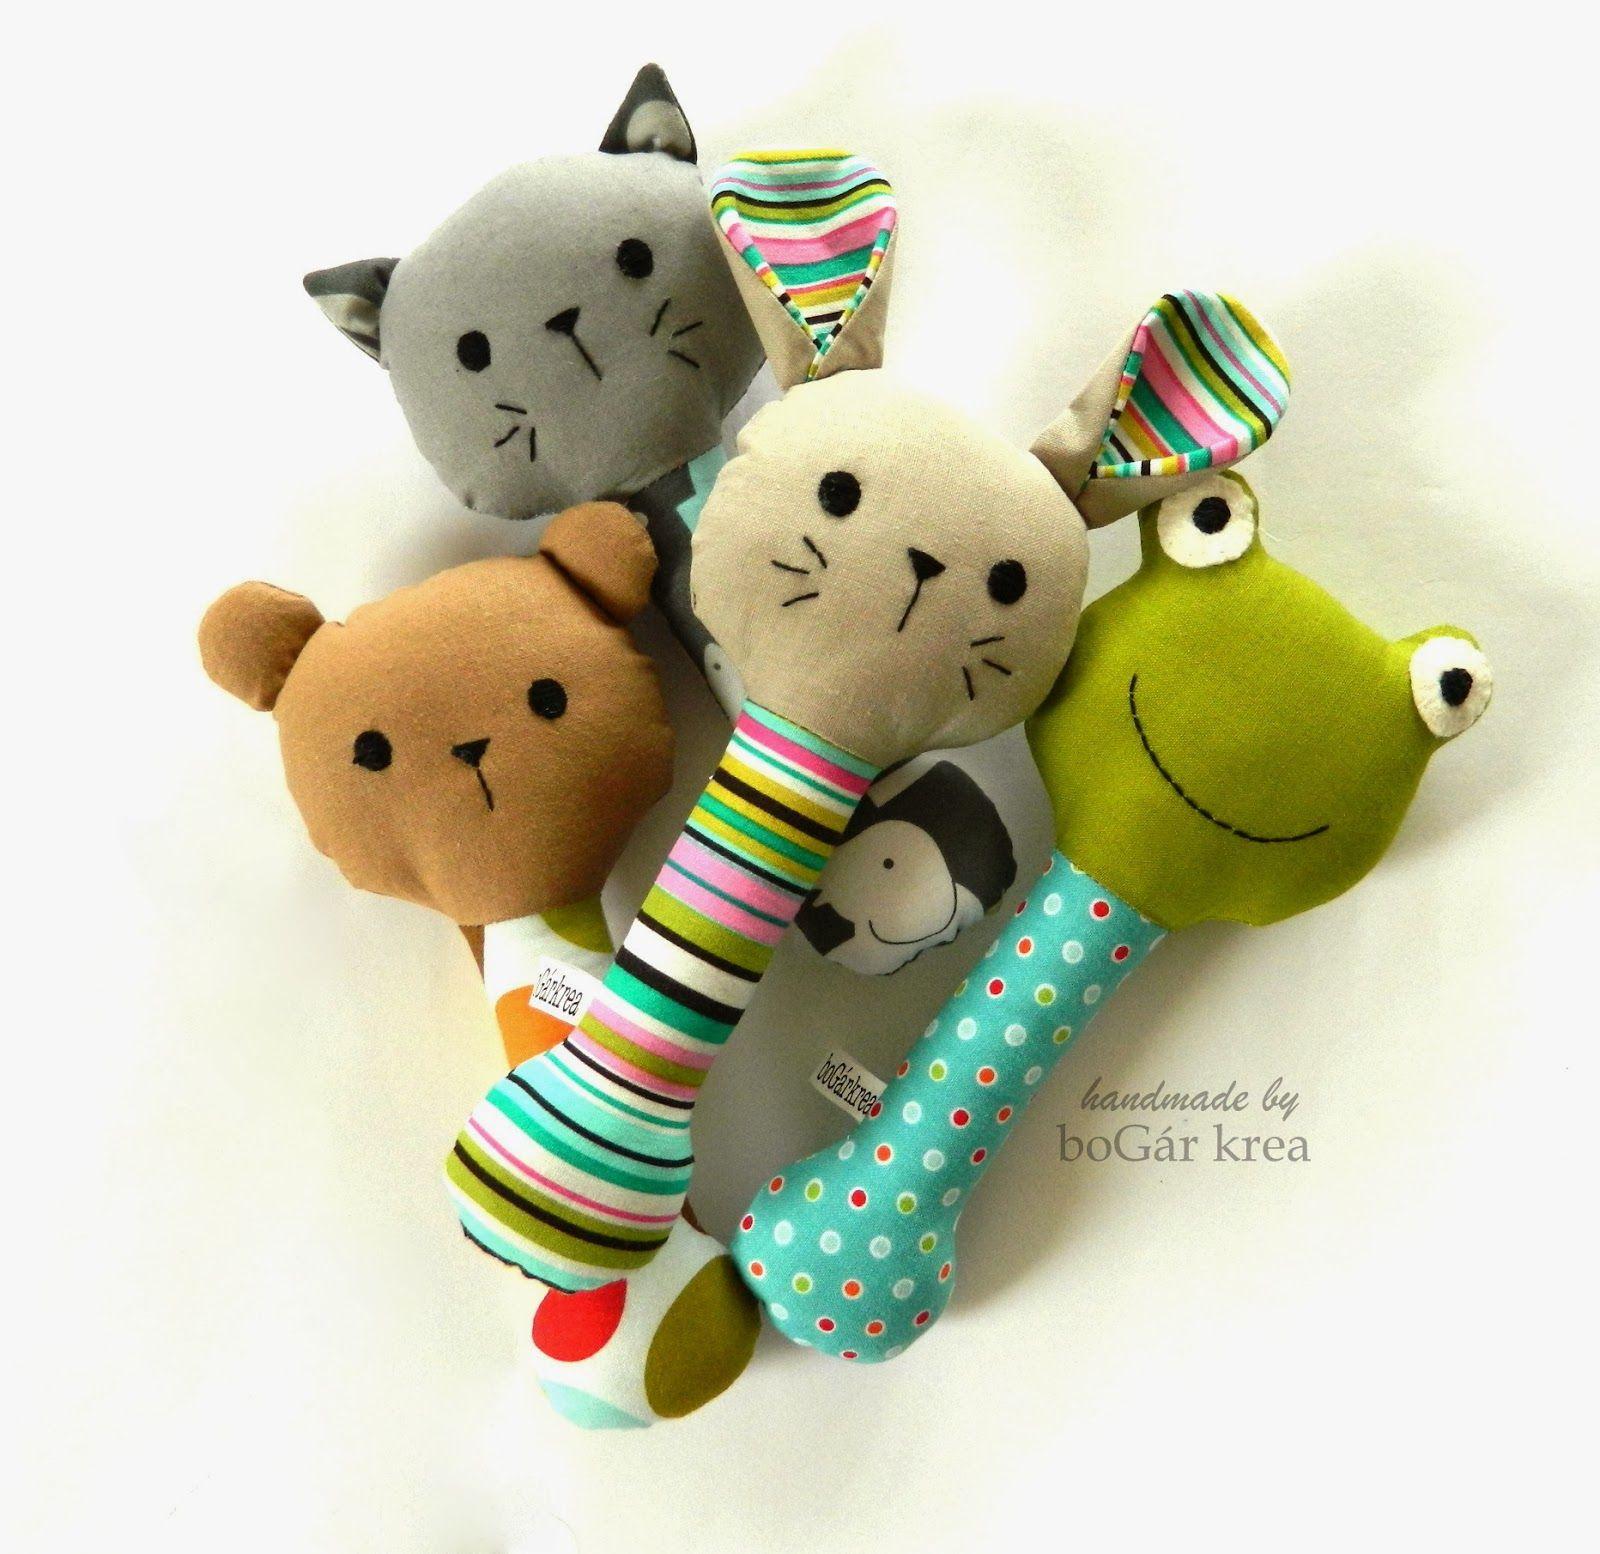 Baby rattle, handmade by boGár krea